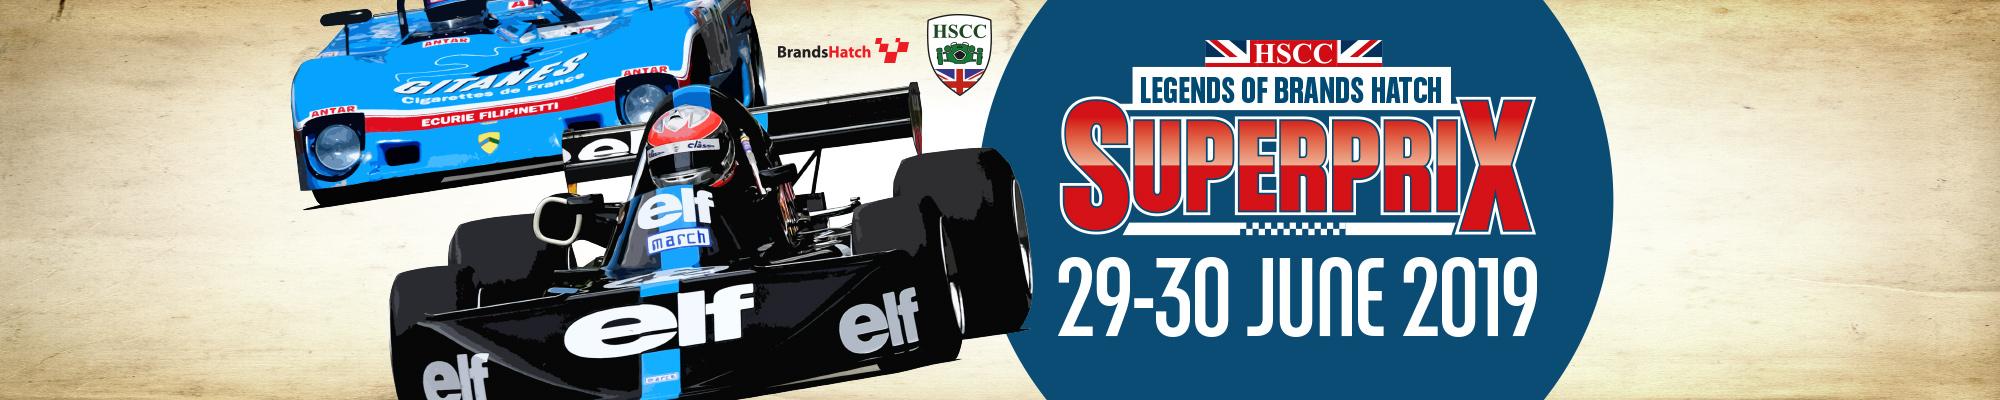 Legends of Brands Hatch Superprix